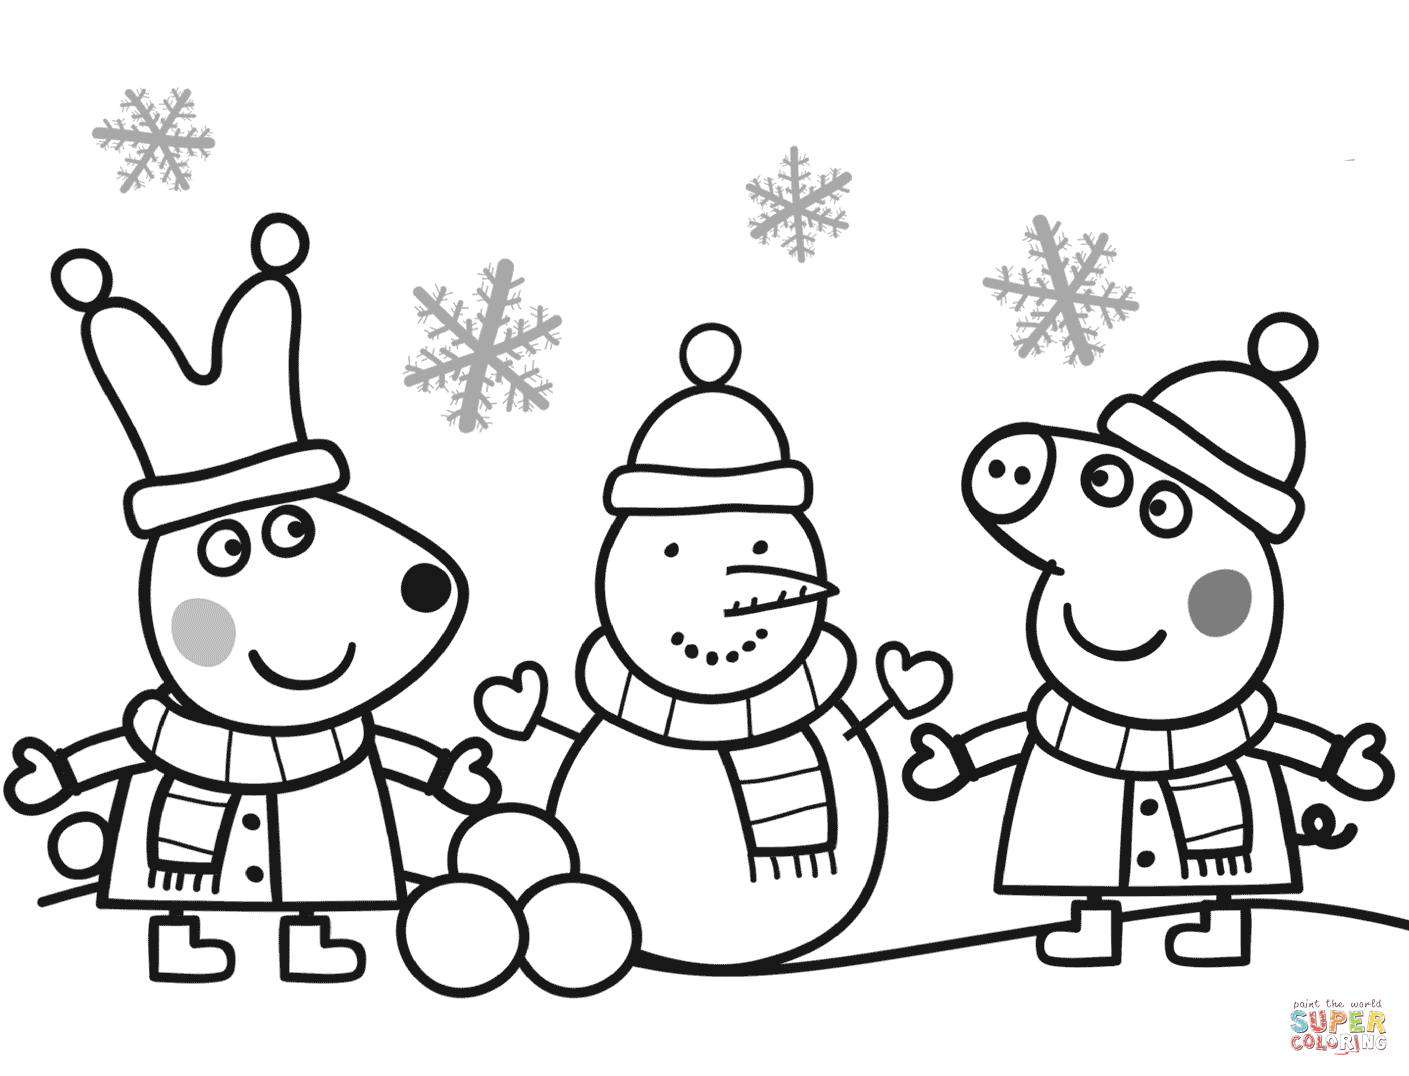 Peppa Pig Christmas Coloring Pages at GetDrawings | Free ...